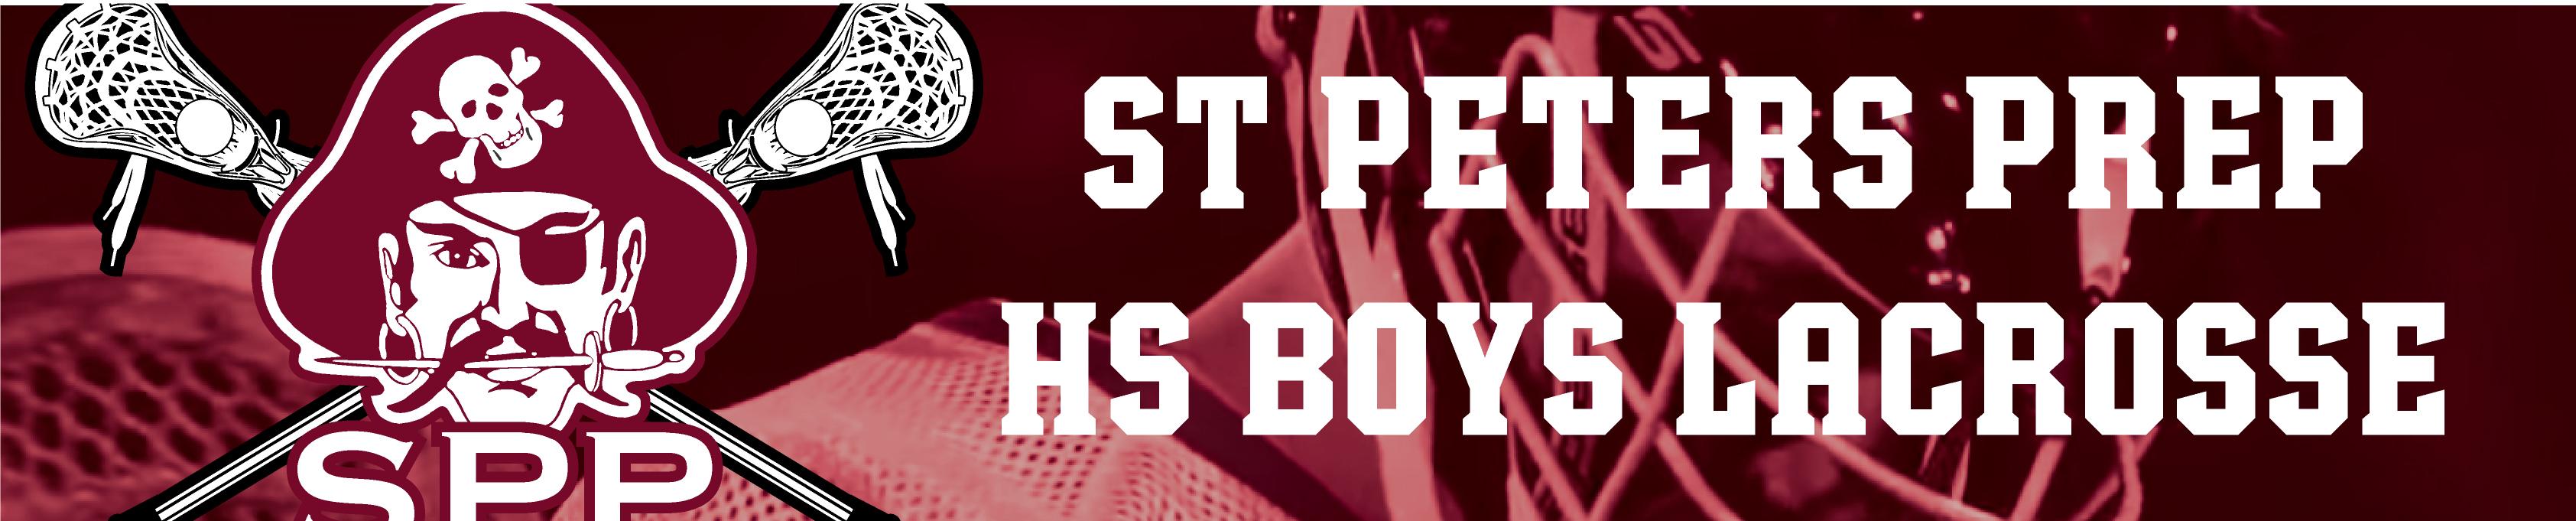 St Peter Prep HS Boys Lacrosse